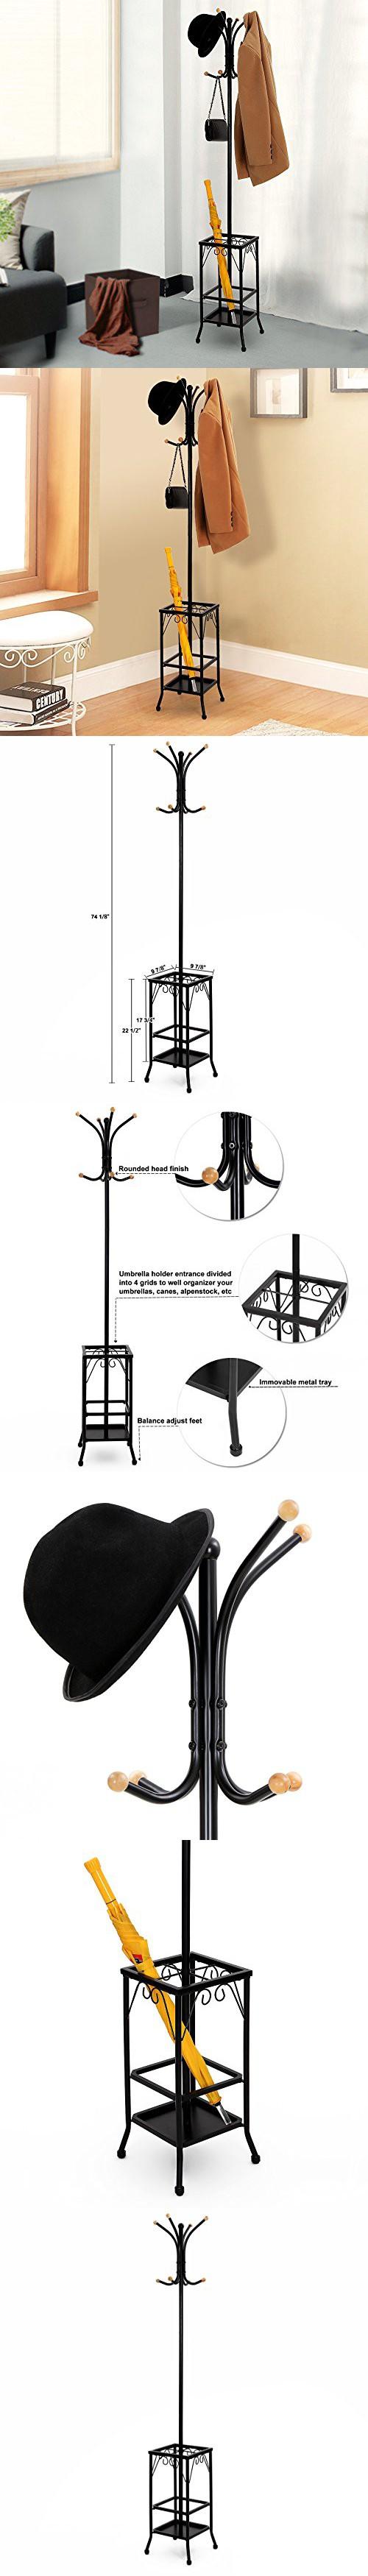 Songmics Standing Coat Rack with Umbrella Holder 8 Hooks Metal with Black Finish URCR25B